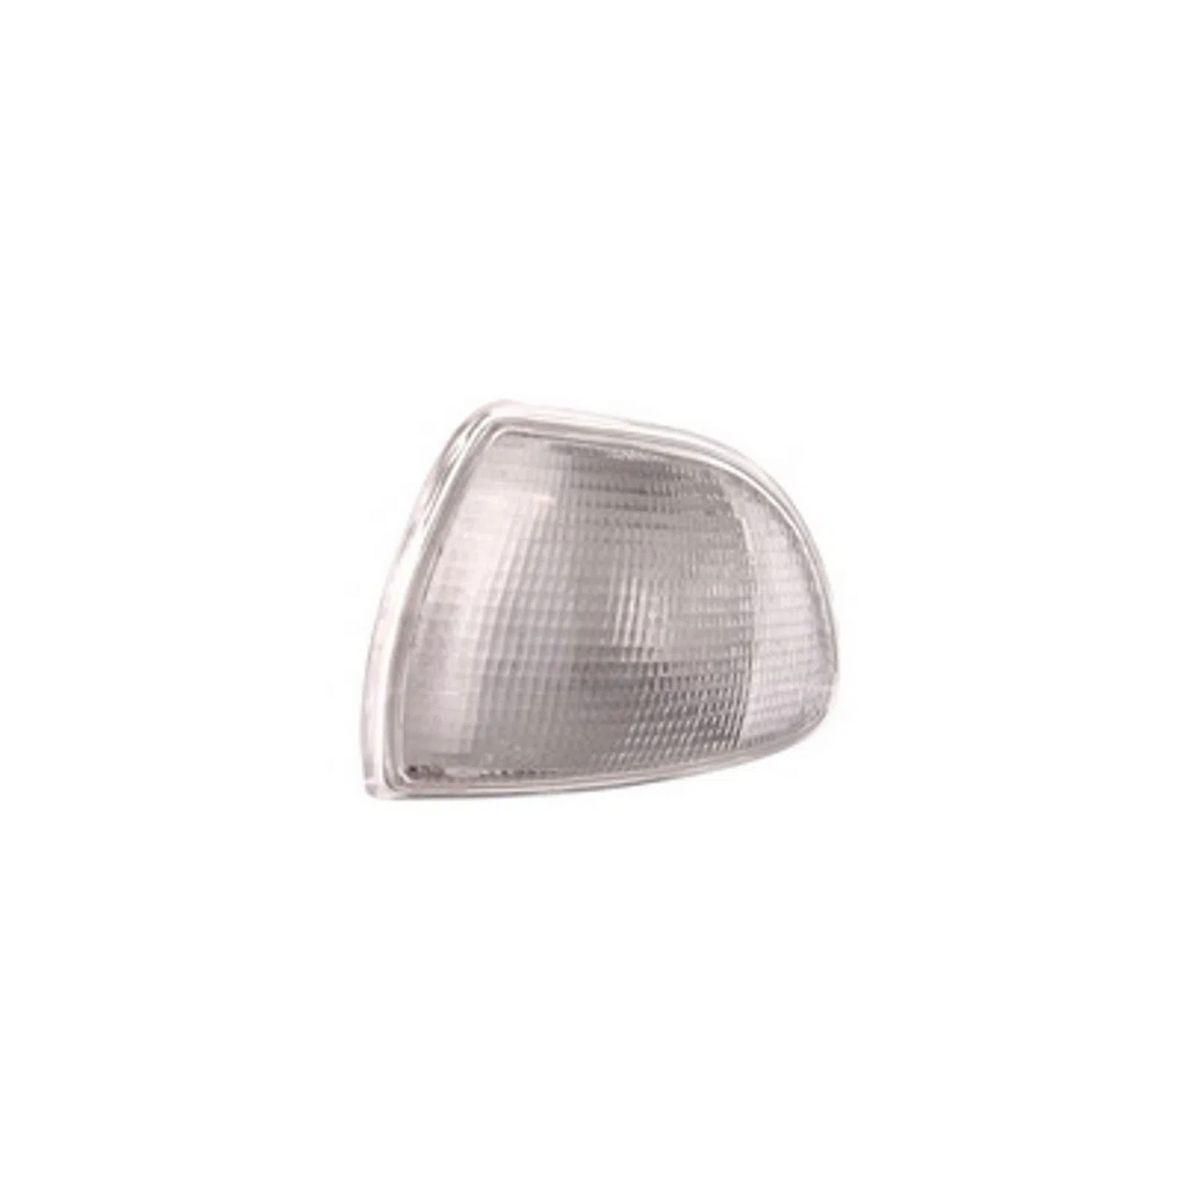 Lanterna Dianteira Esquerda Palio Siena 1996/2000 Cristal